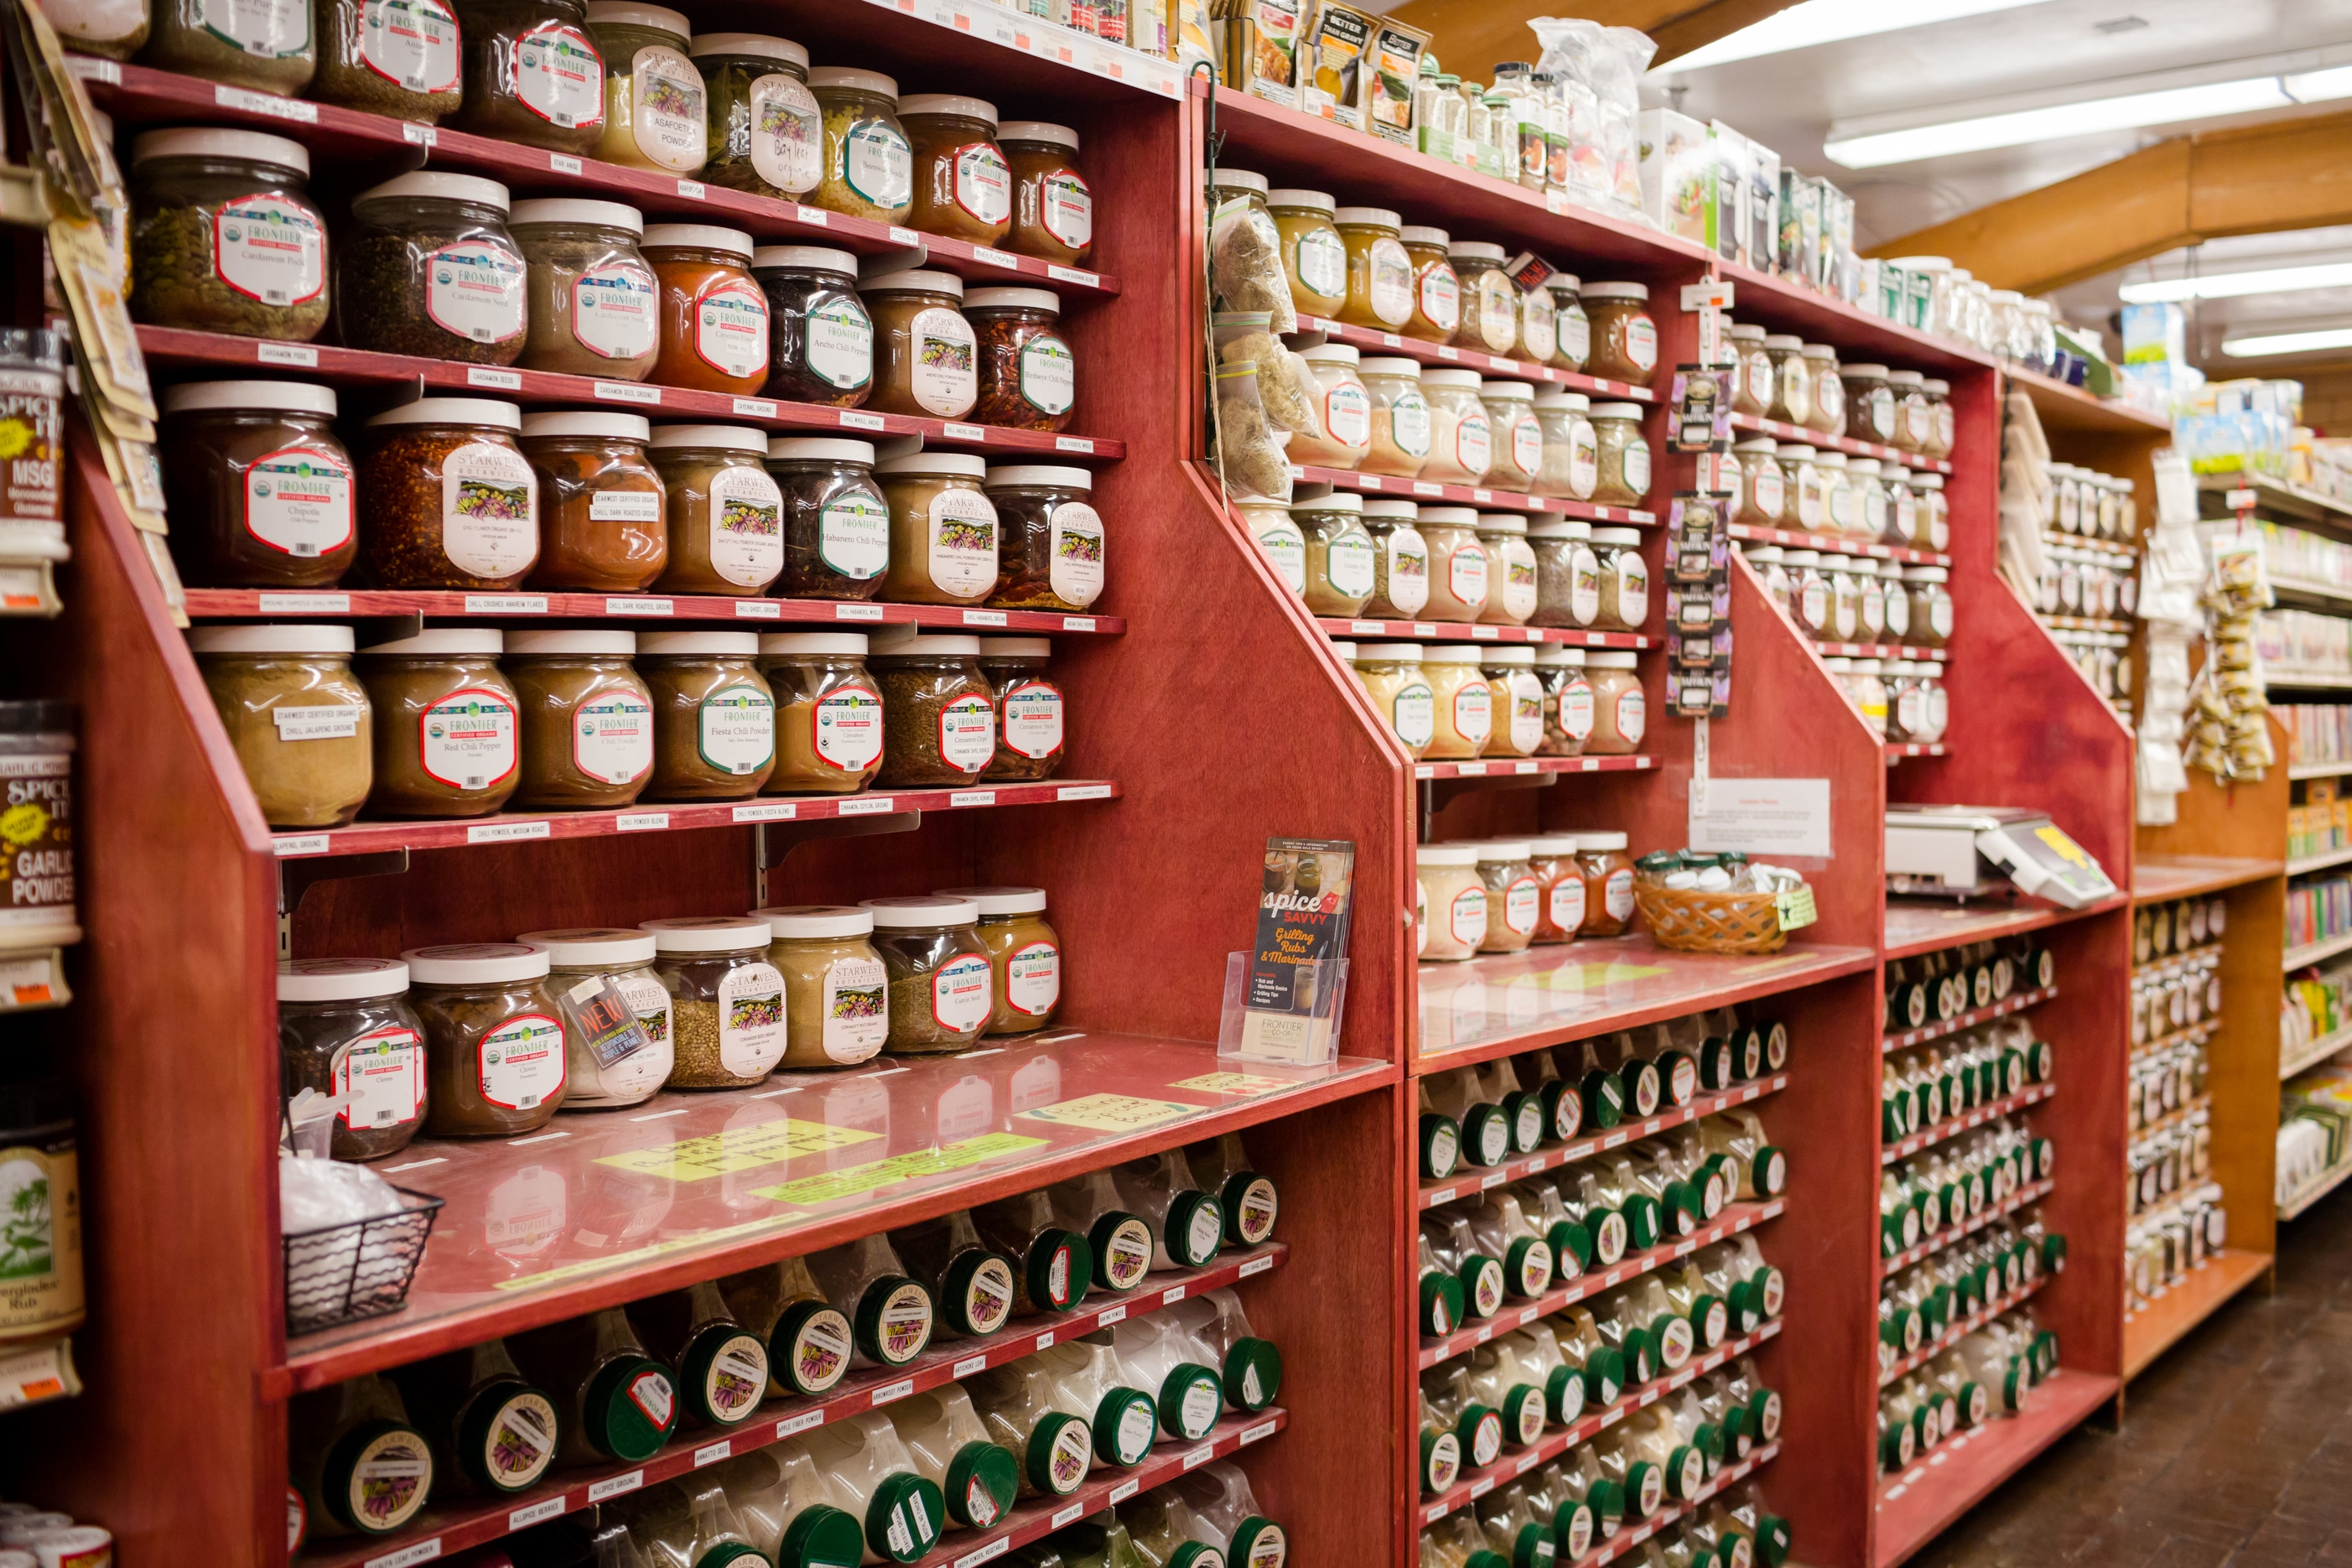 Ward's Supermarket Spice Food Aisle Gainesville FL